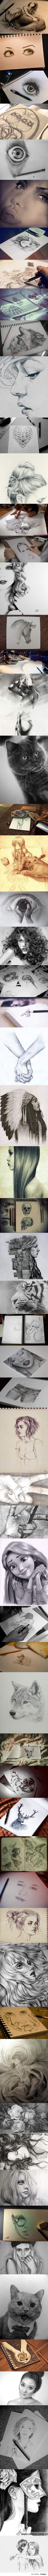 Interesting Digital Art